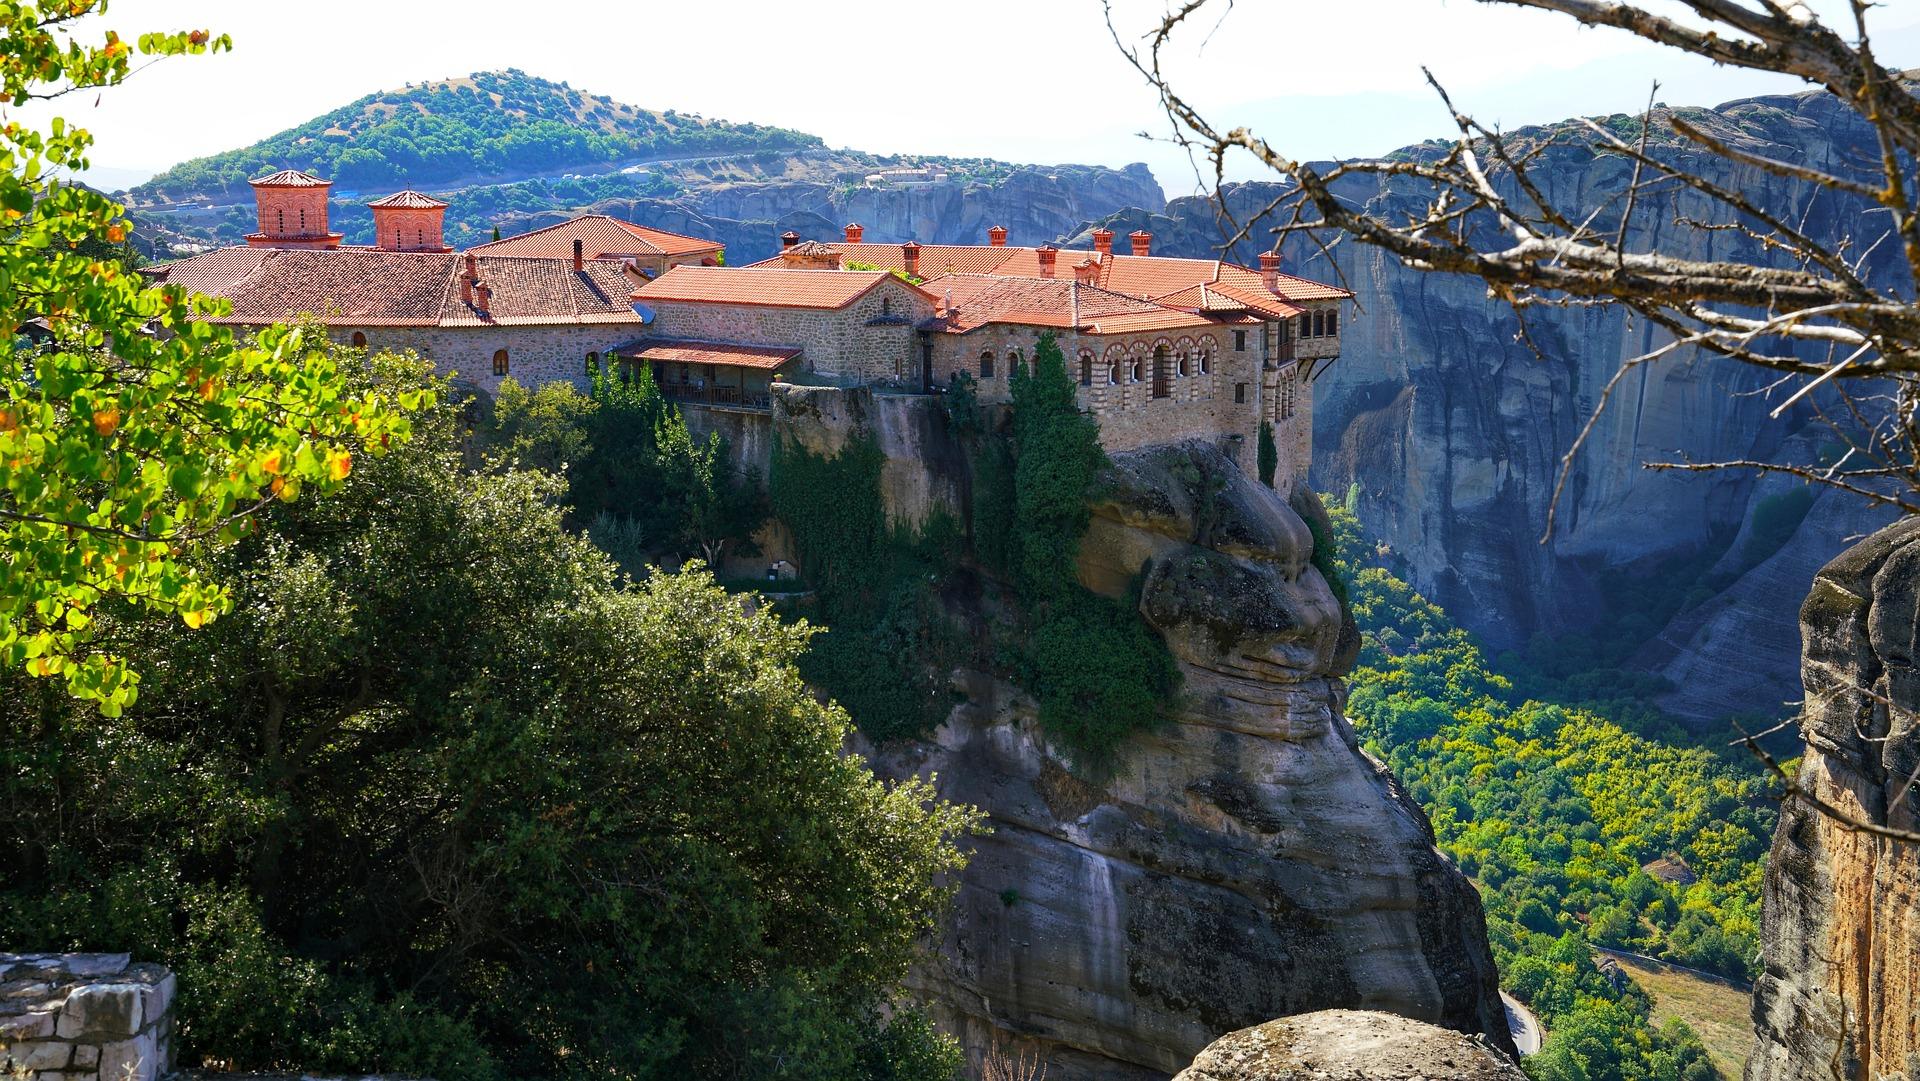 One of six remaining monasteries in Meteora, Greece